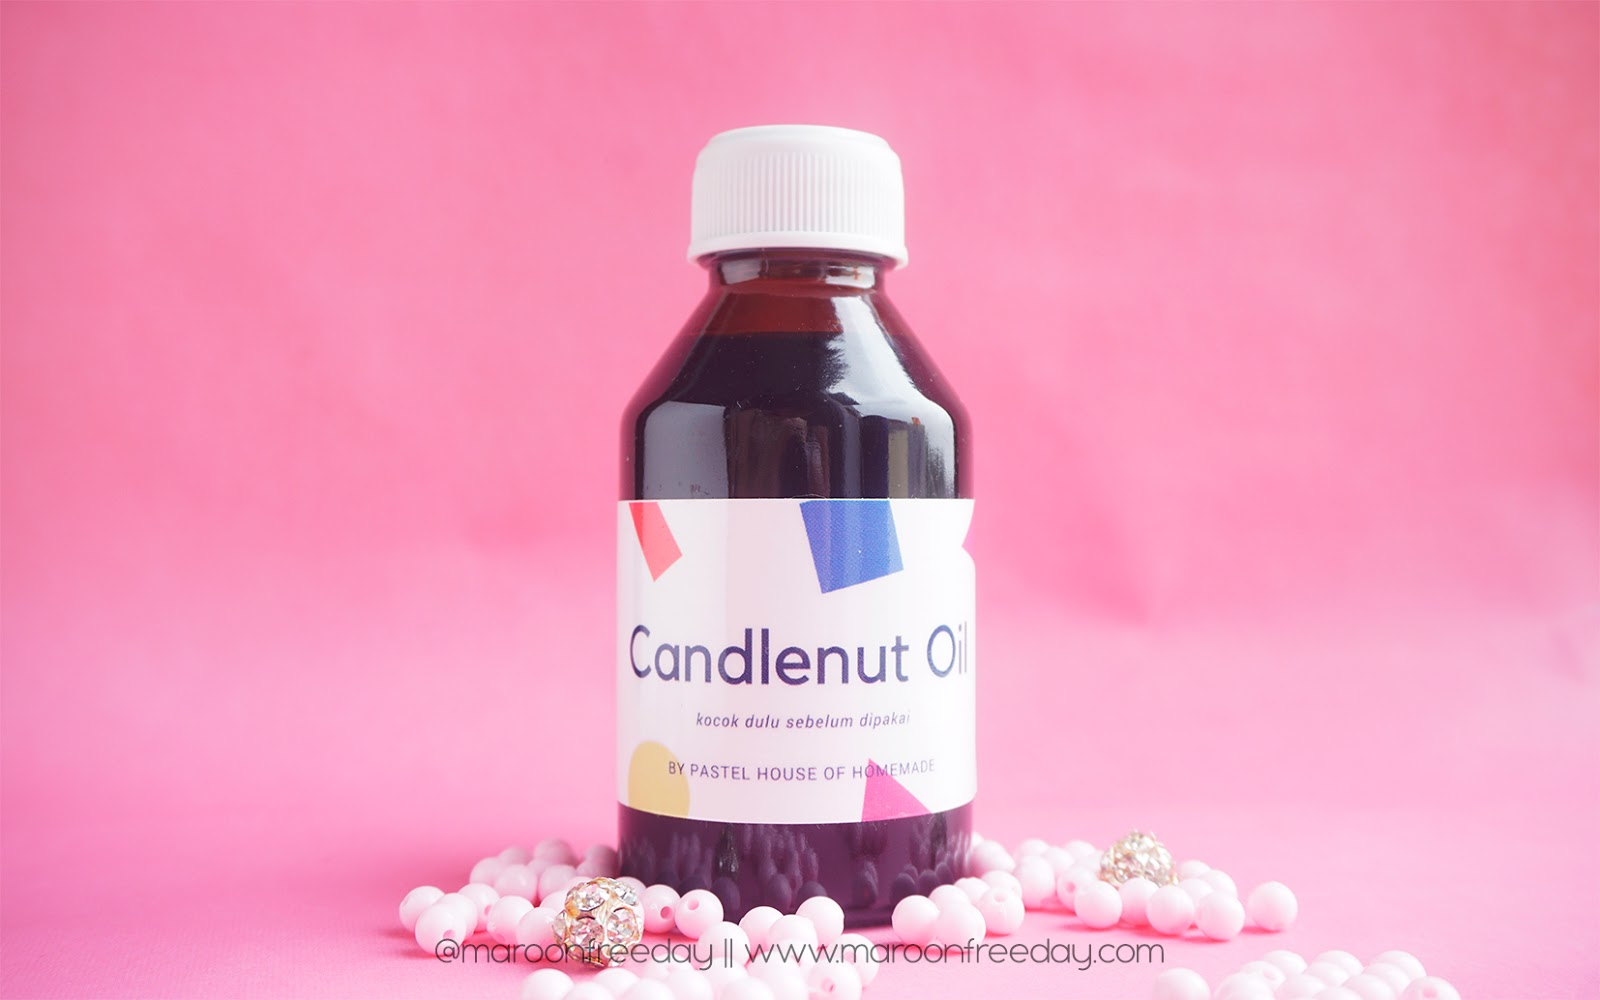 Review Candlenut Oil Minyak Kemiri Untuk Menyuburkan Rambut By Pastel Maroon Freeday